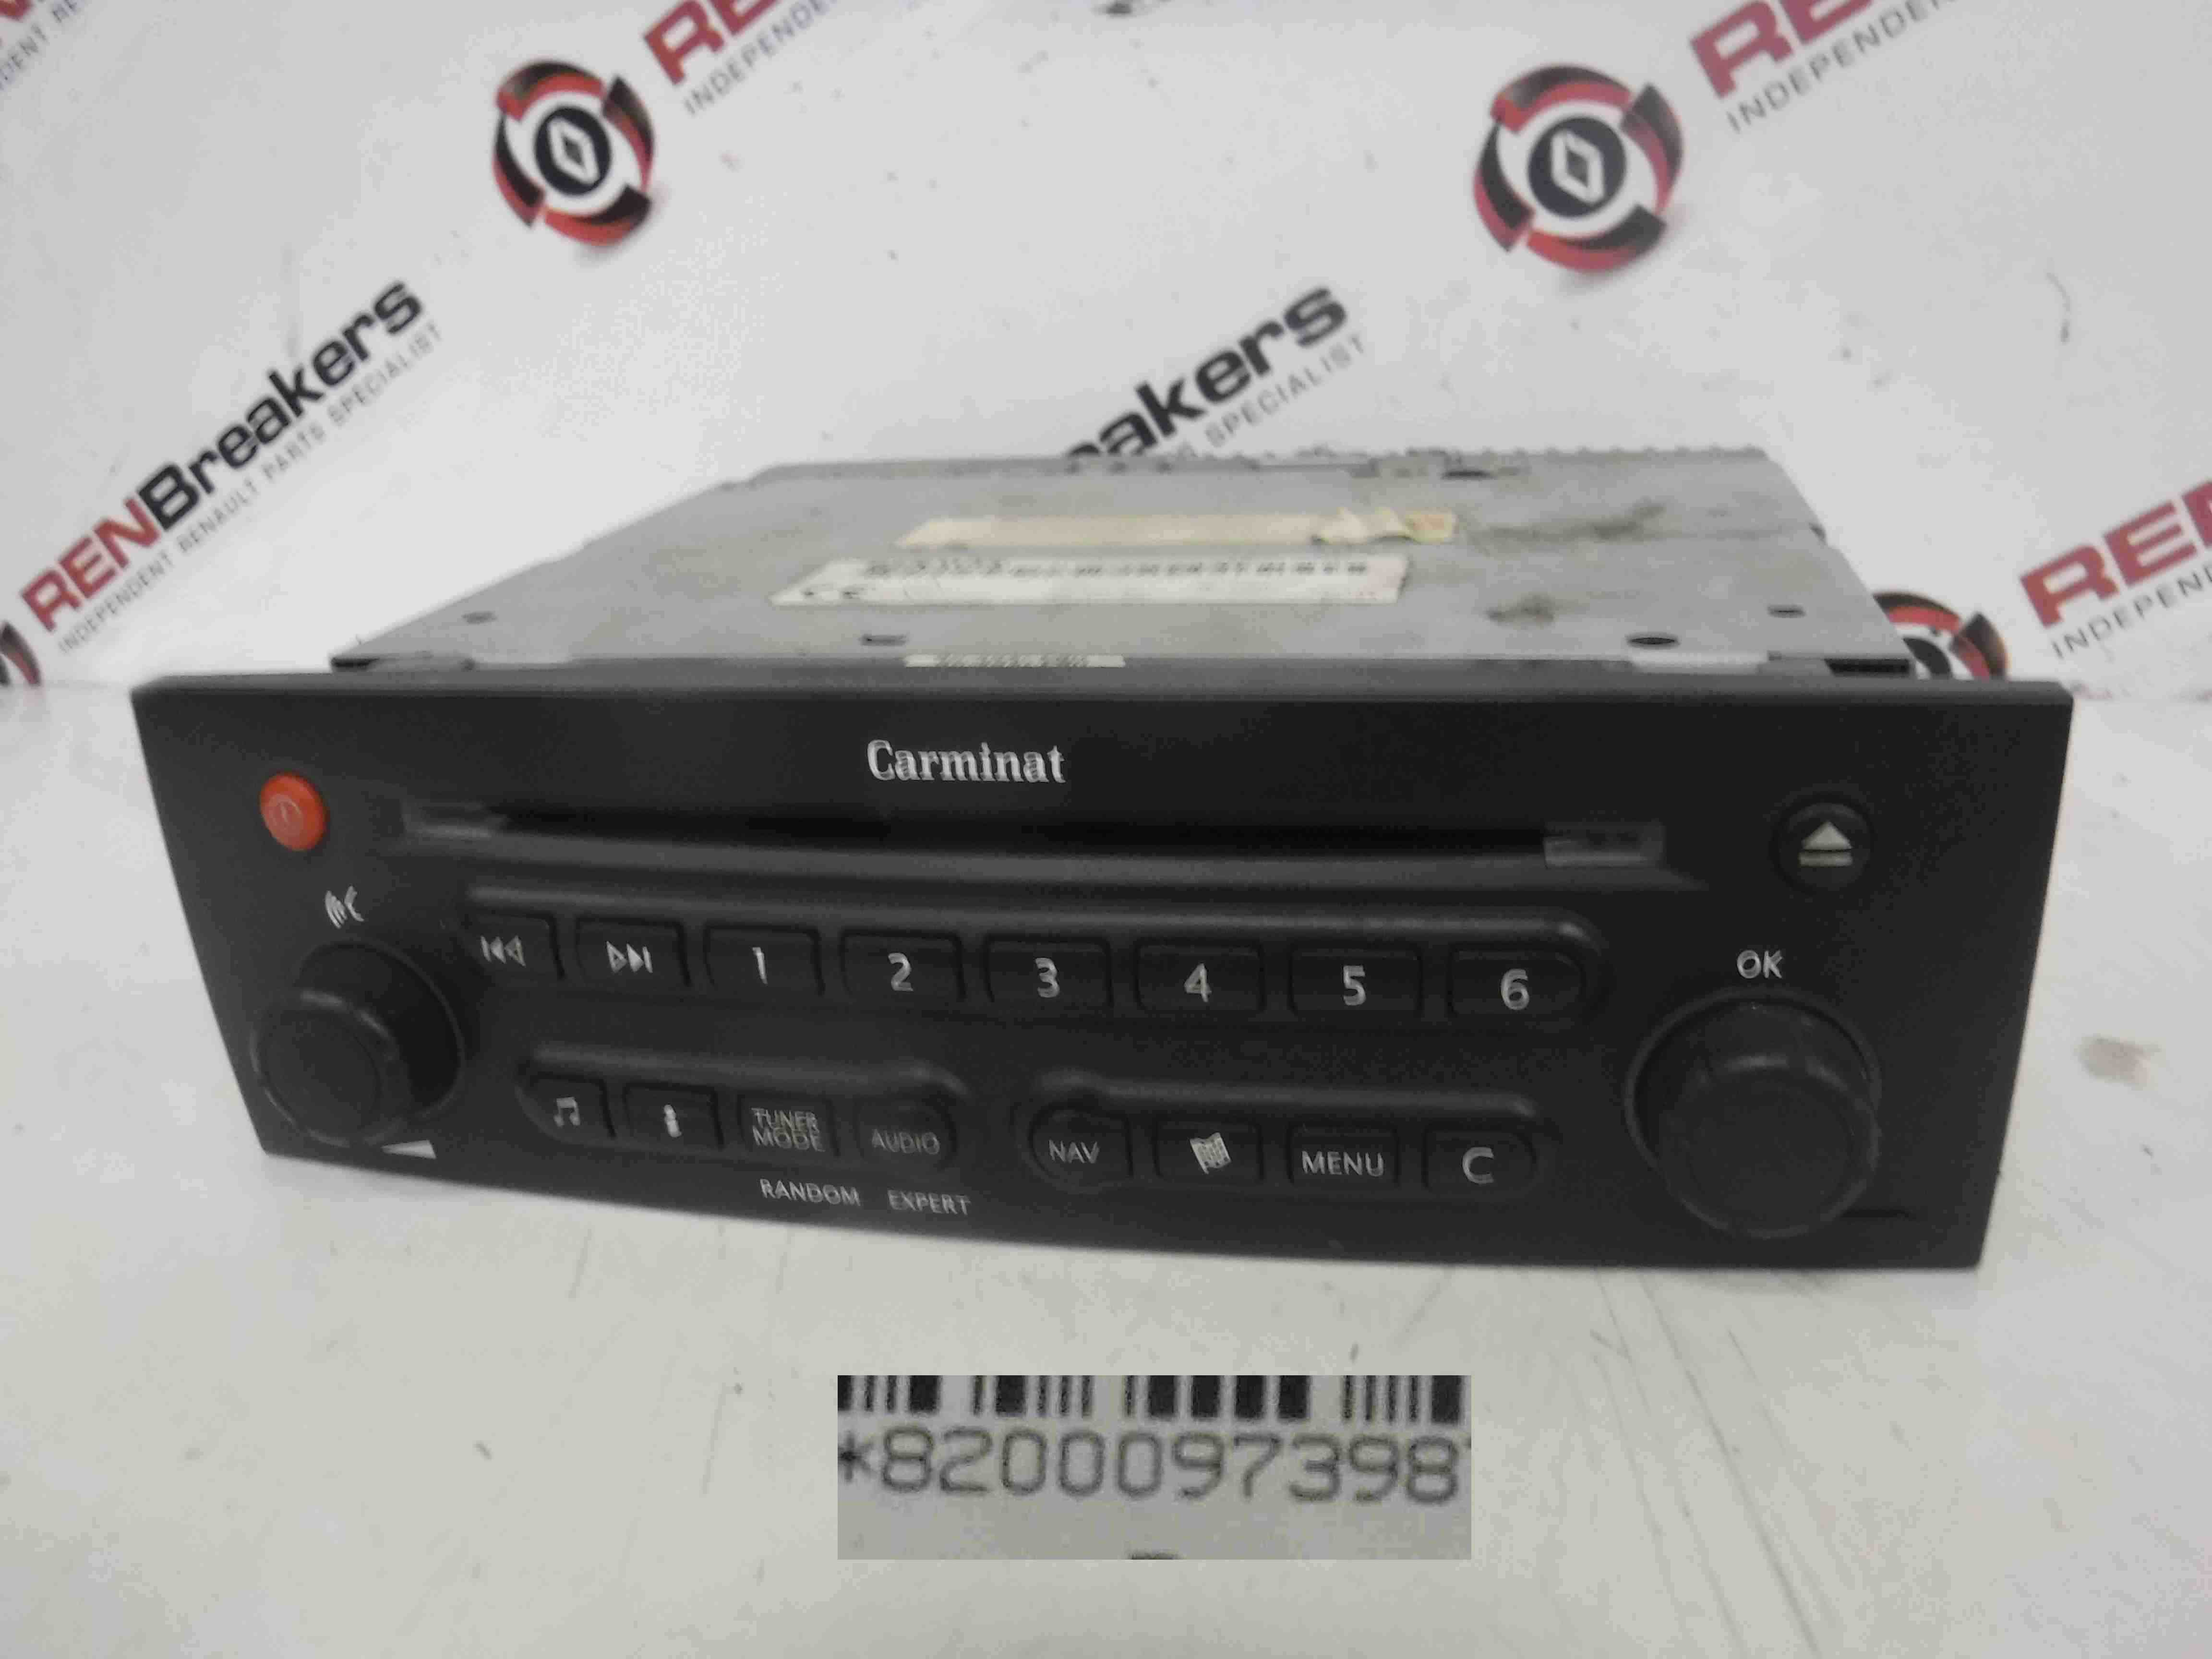 Renault Megane Trafic Laguna 2001-2012 Carminat GPS Sat Nav Radio Player